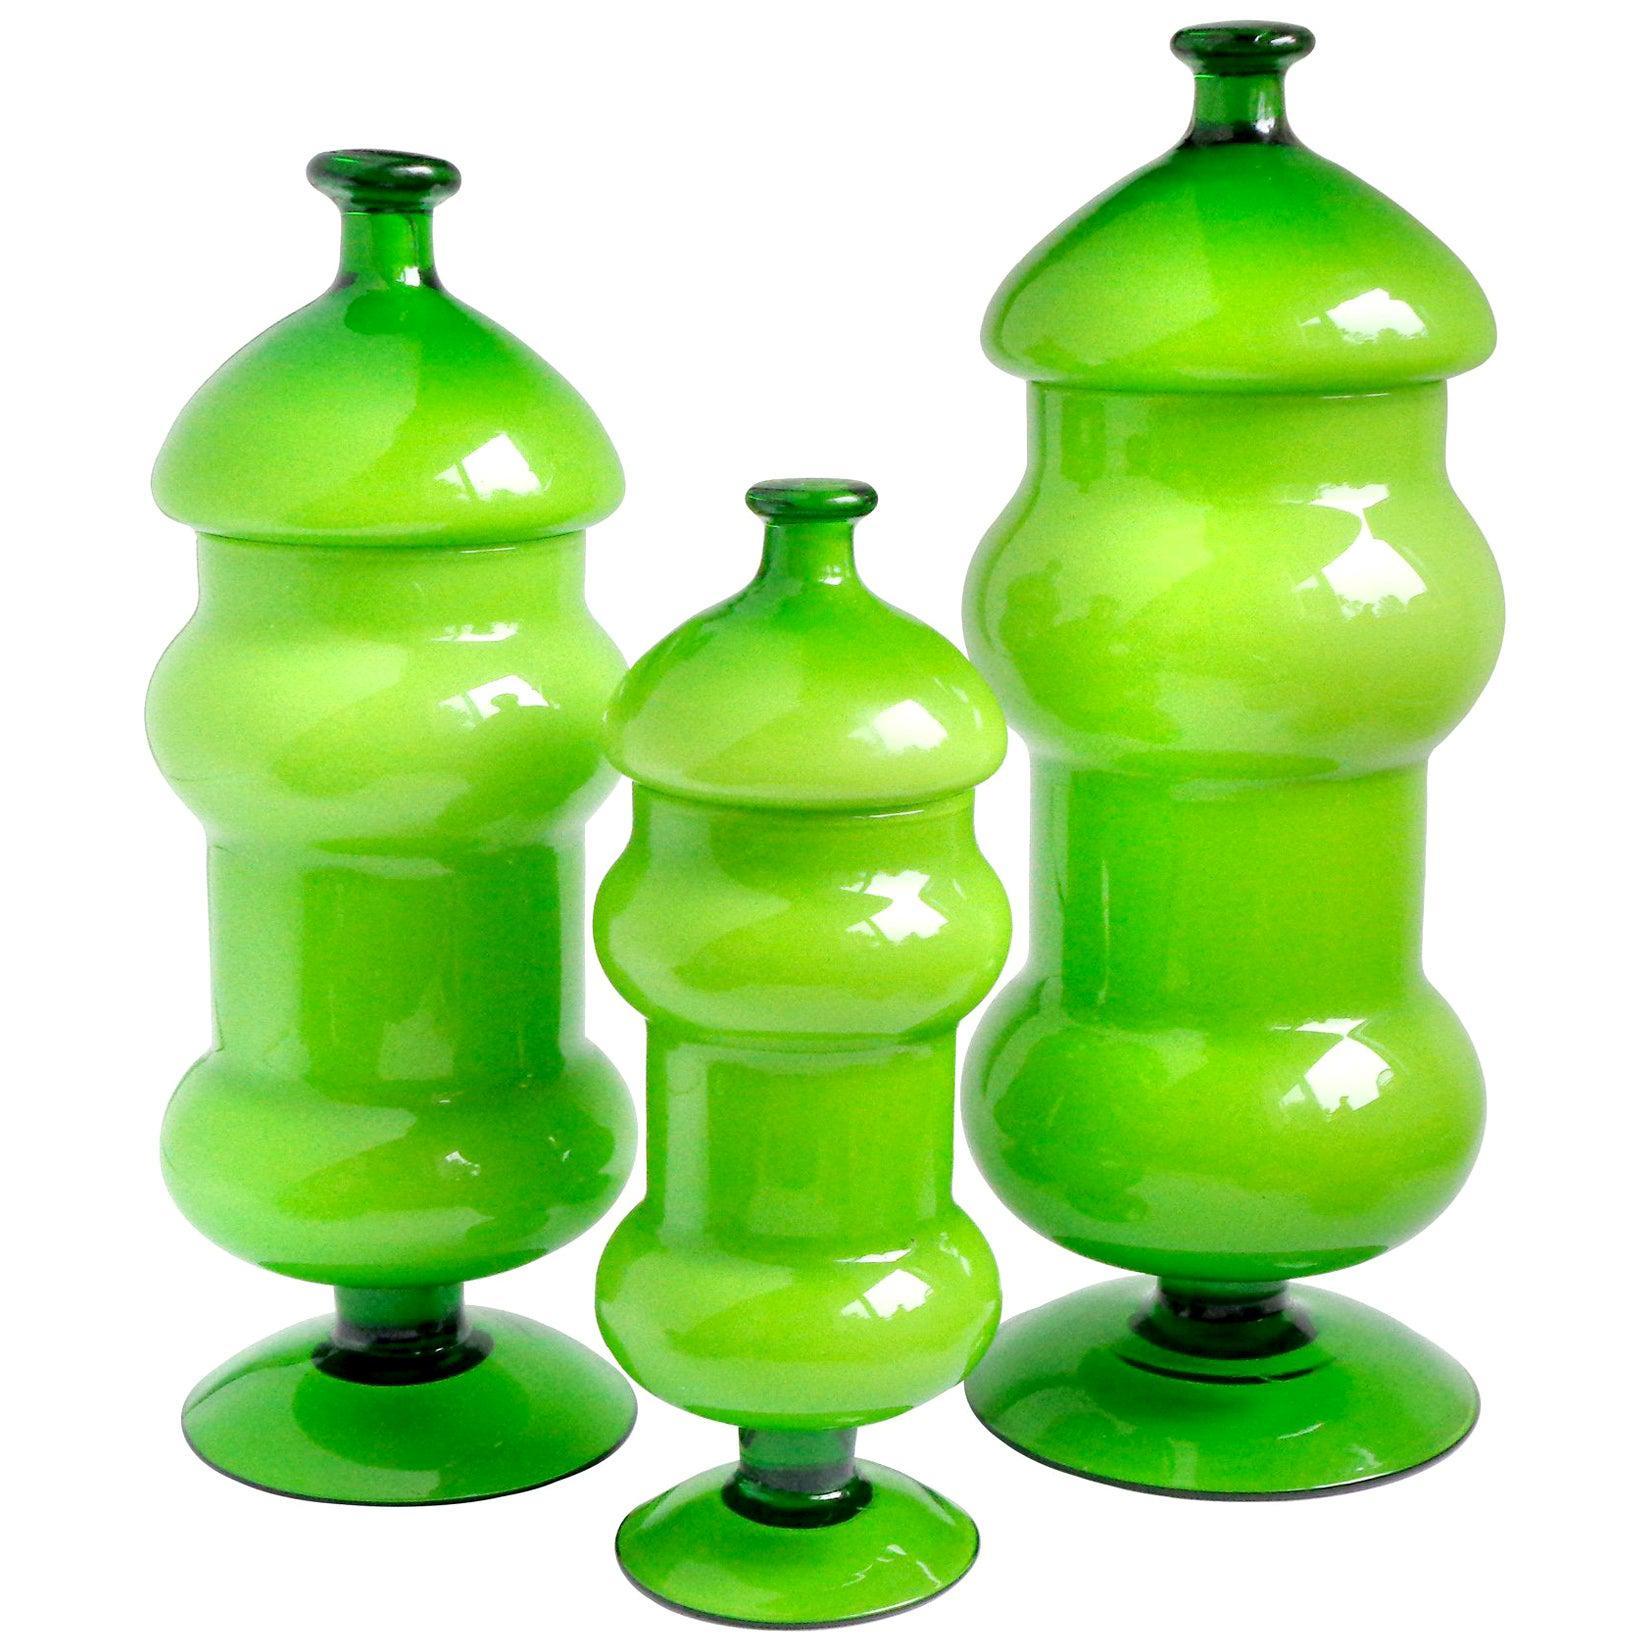 Empoli Bright Green White Italian Art Glass Three-Piece Container Cookie Jar Set